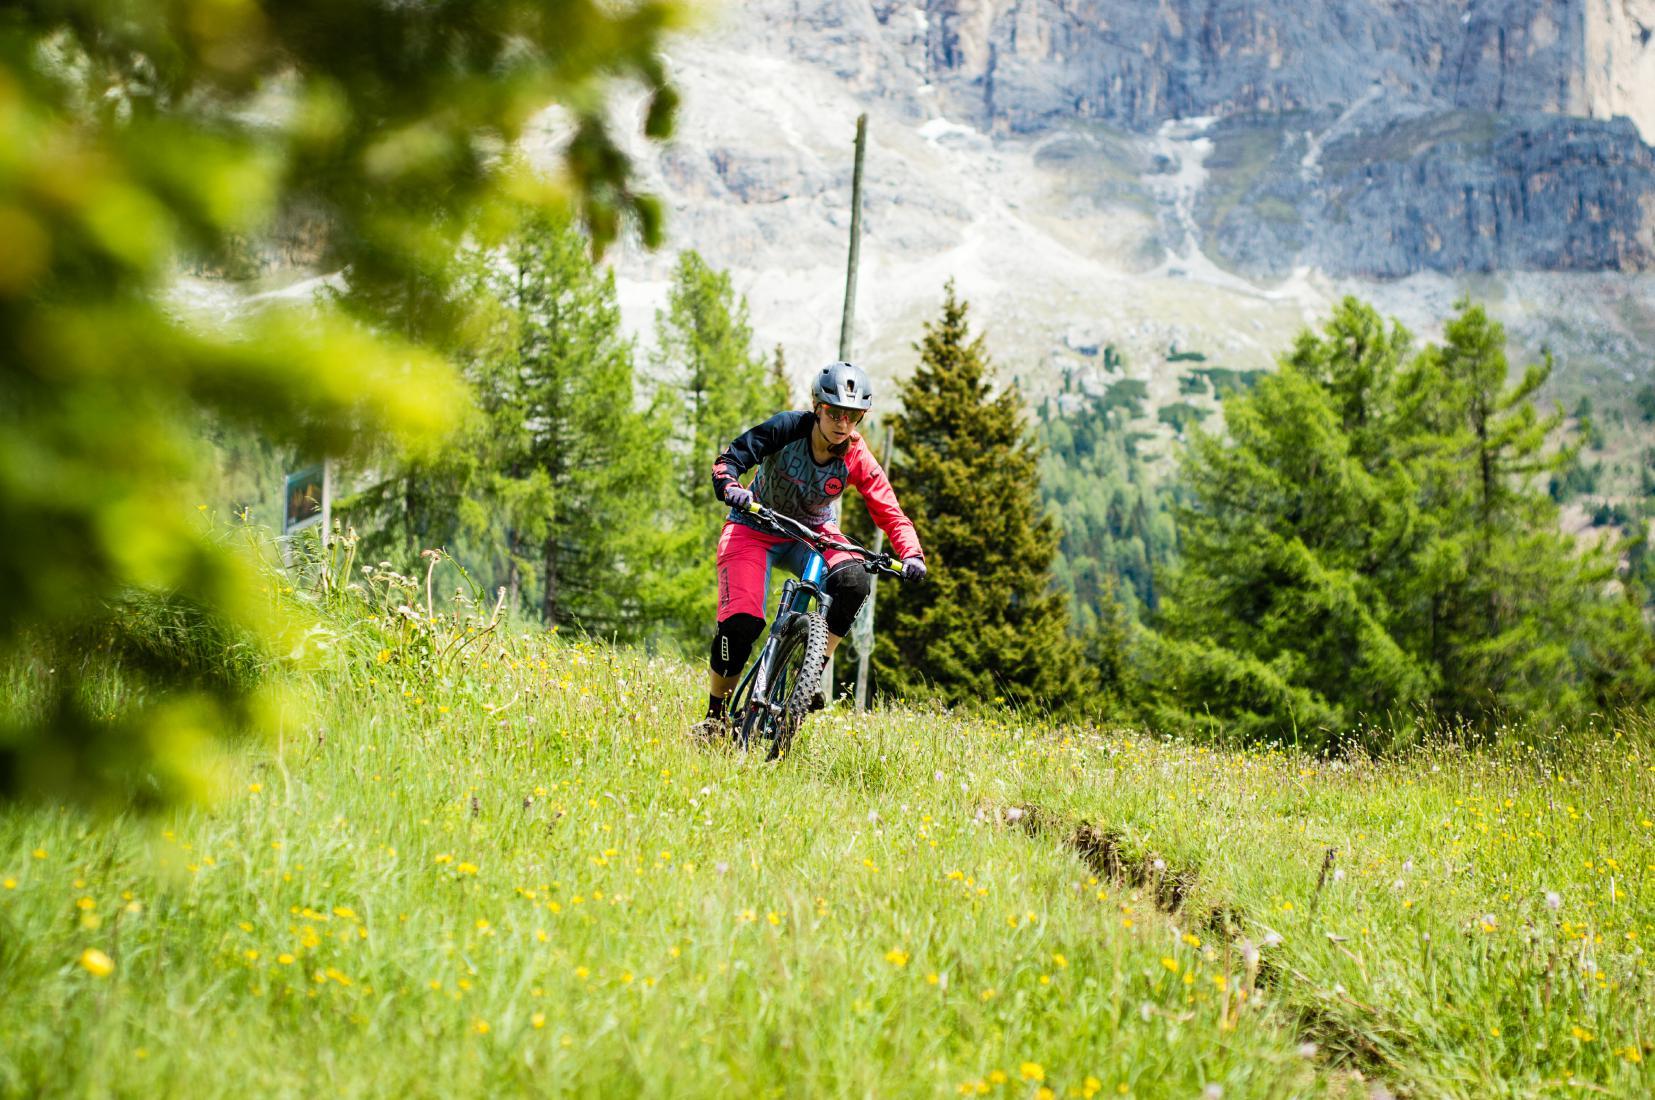 Endlose Singletrails schlängeln sich in den Dolomiten gen Tal.